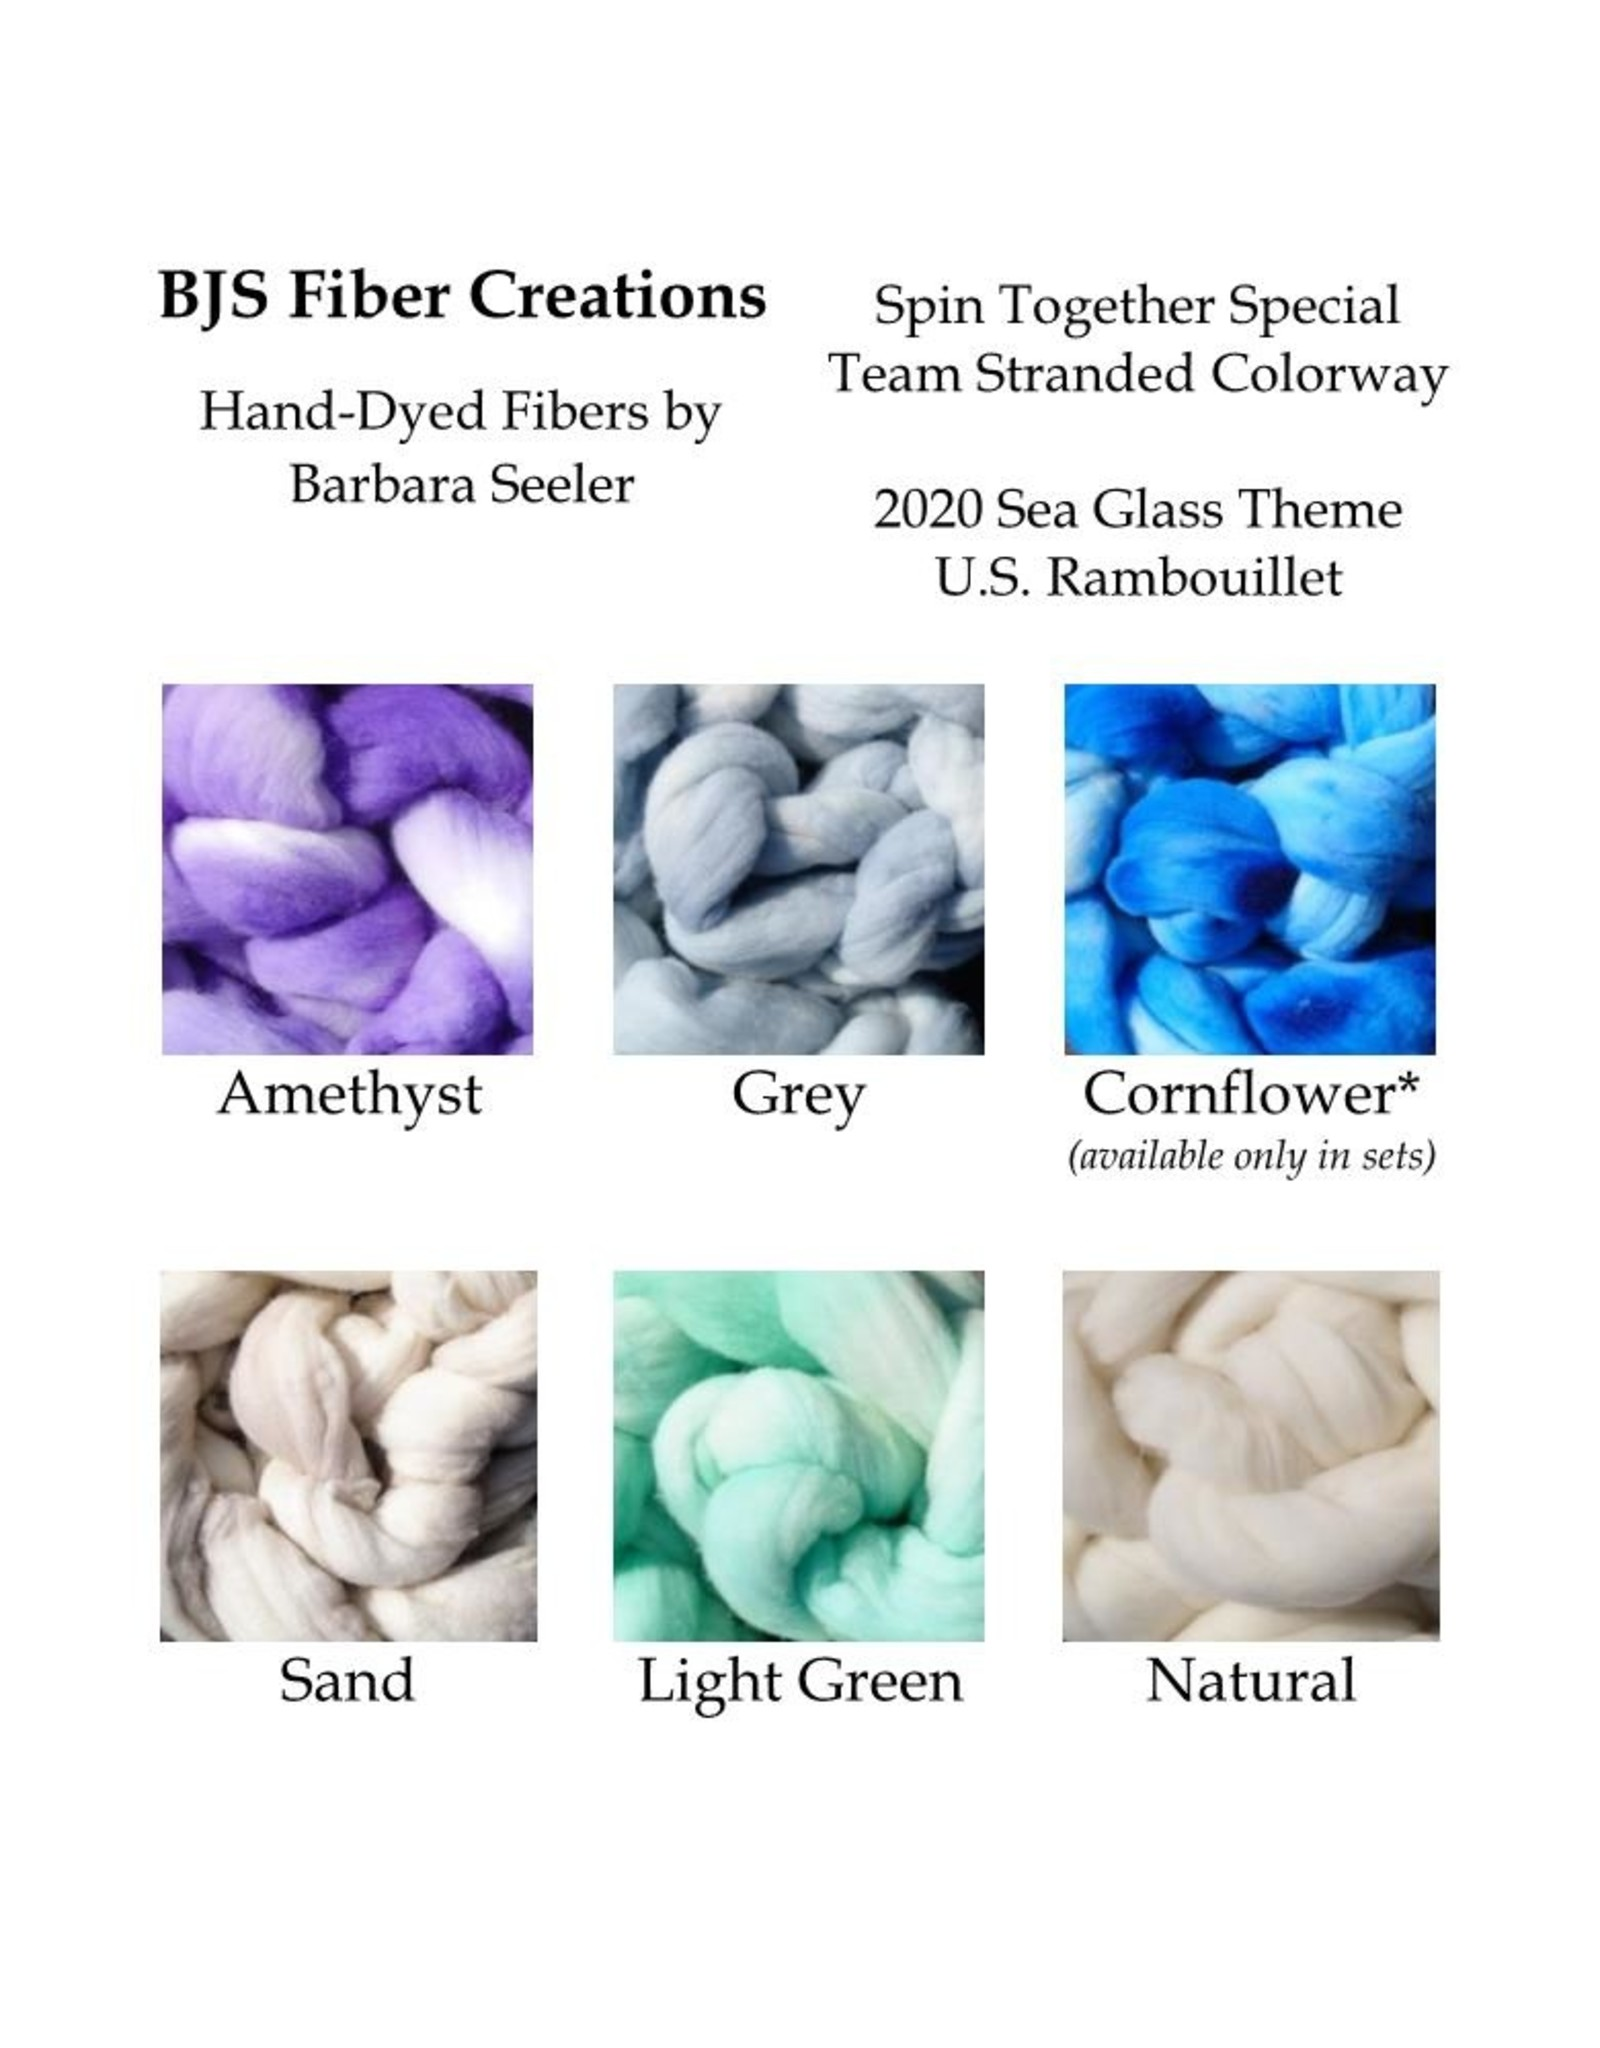 BJS Fiber Creations Spin Together Team 2020 Sea Glass 2oz Bumps